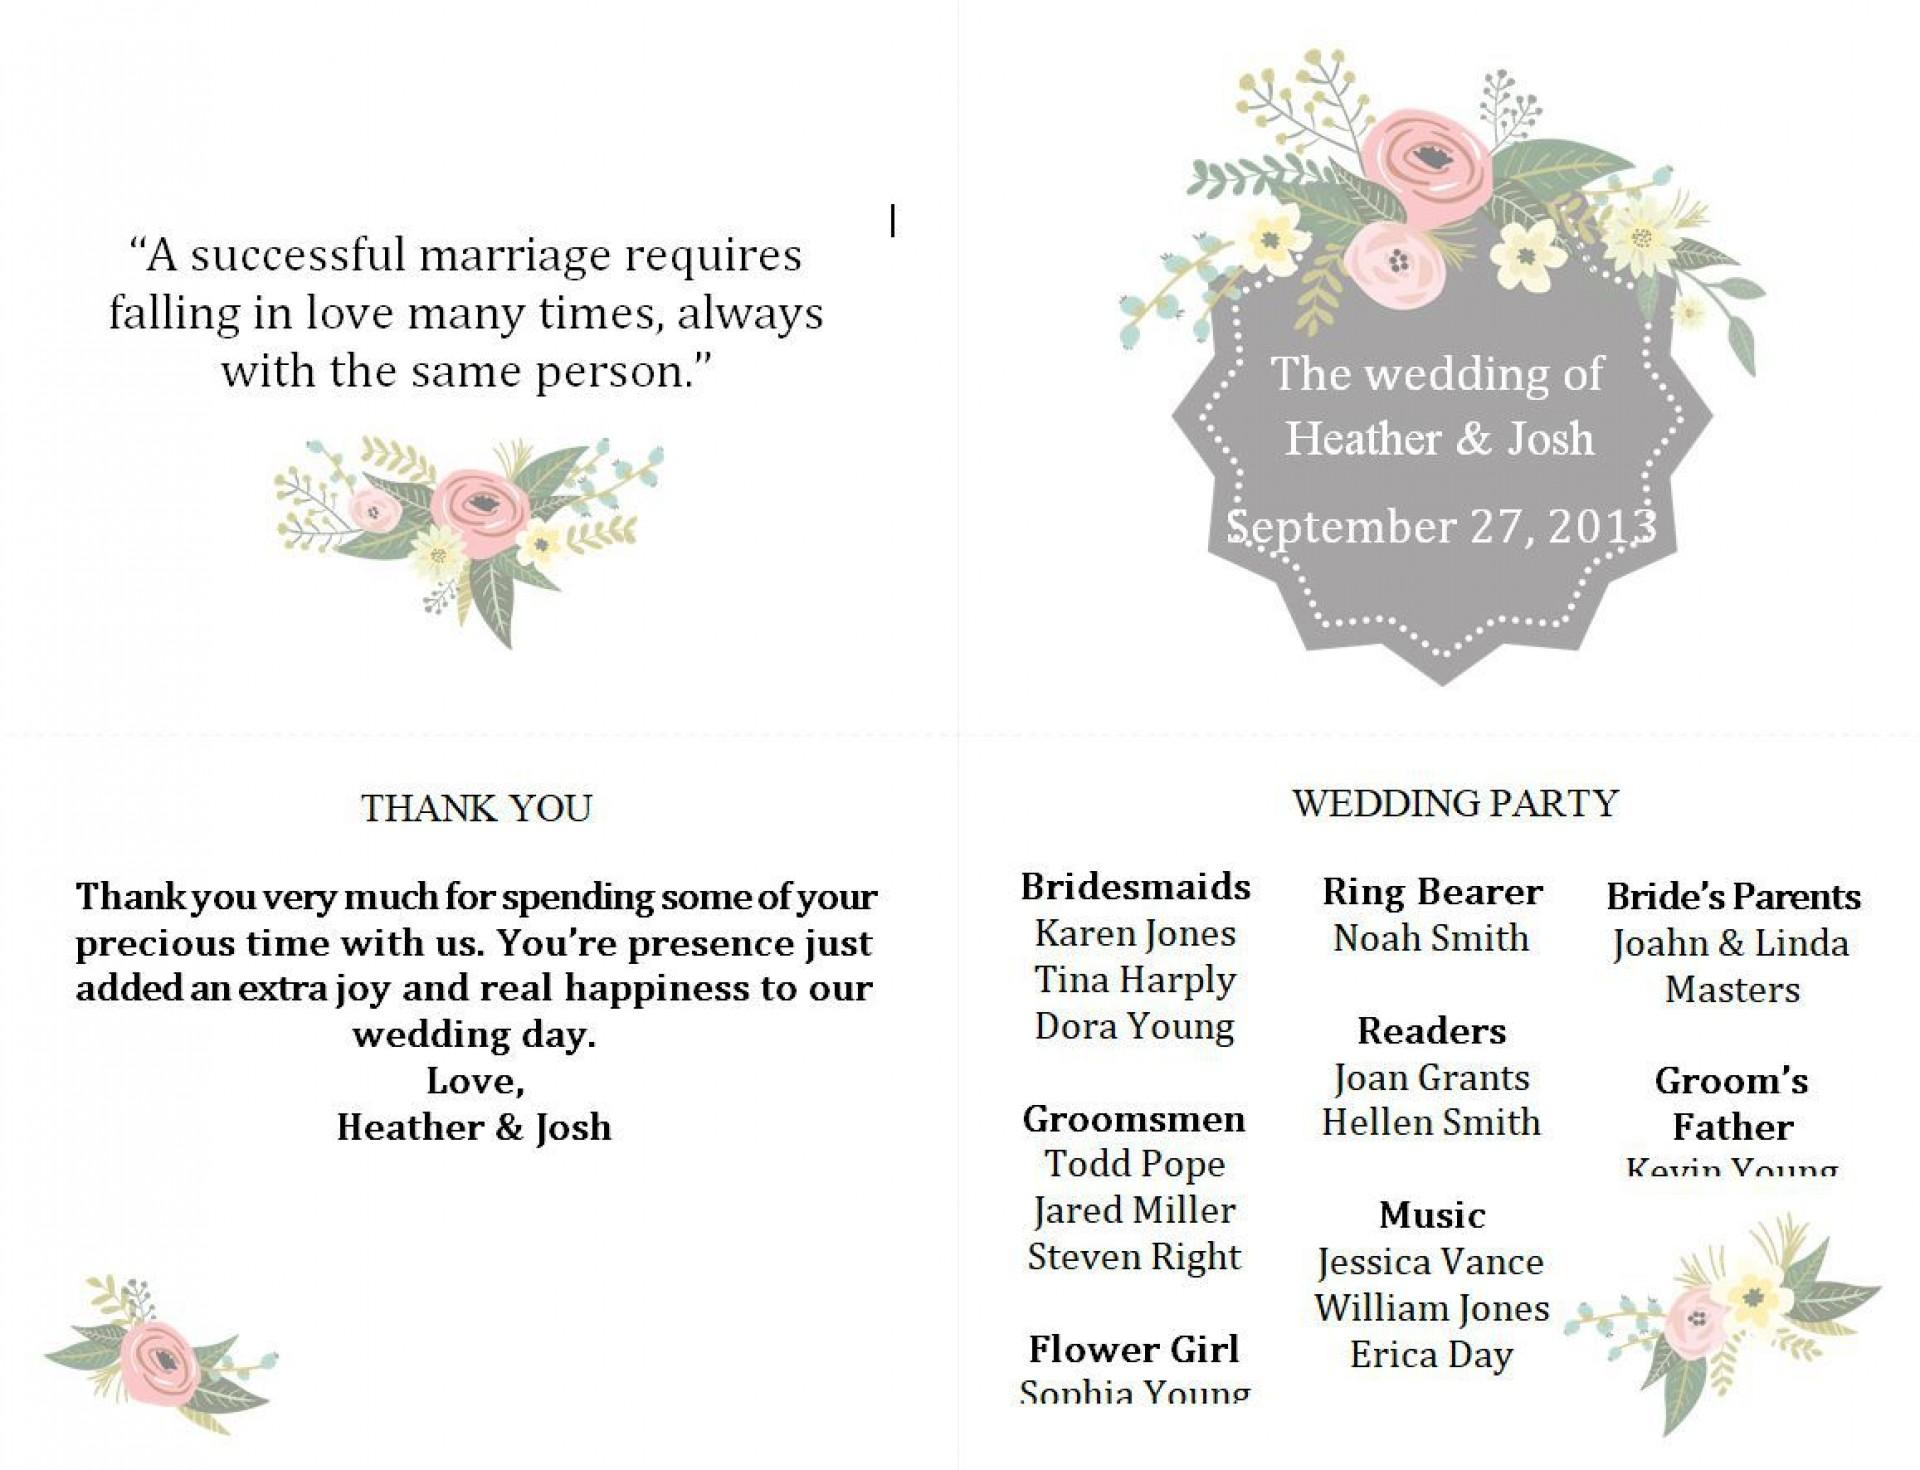 003 Fantastic Free Download Template For Wedding Program Idea  Programs1920